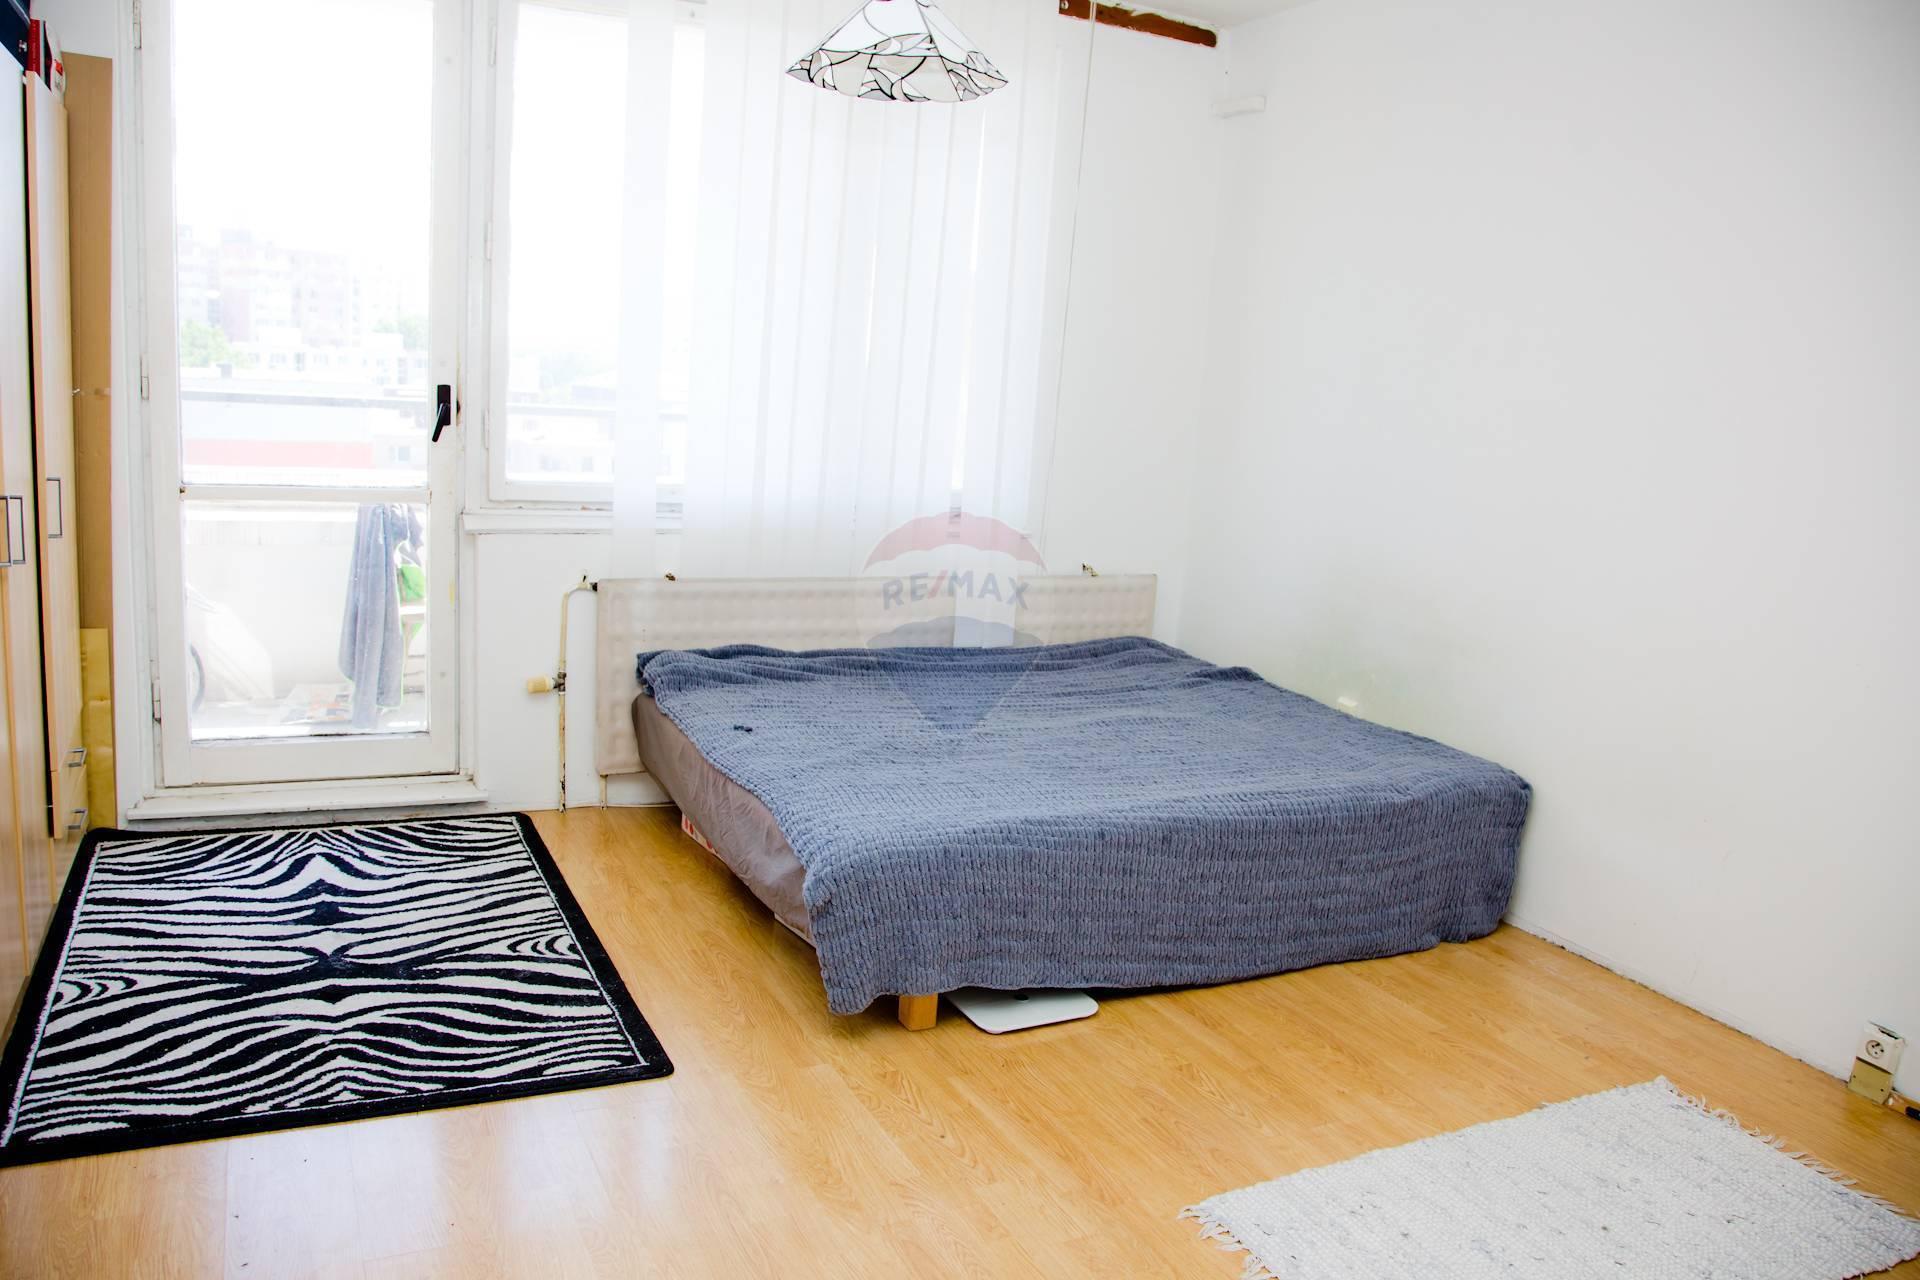 Predaj bytu (3 izbový) 69 m2, Bratislava - Petržalka -